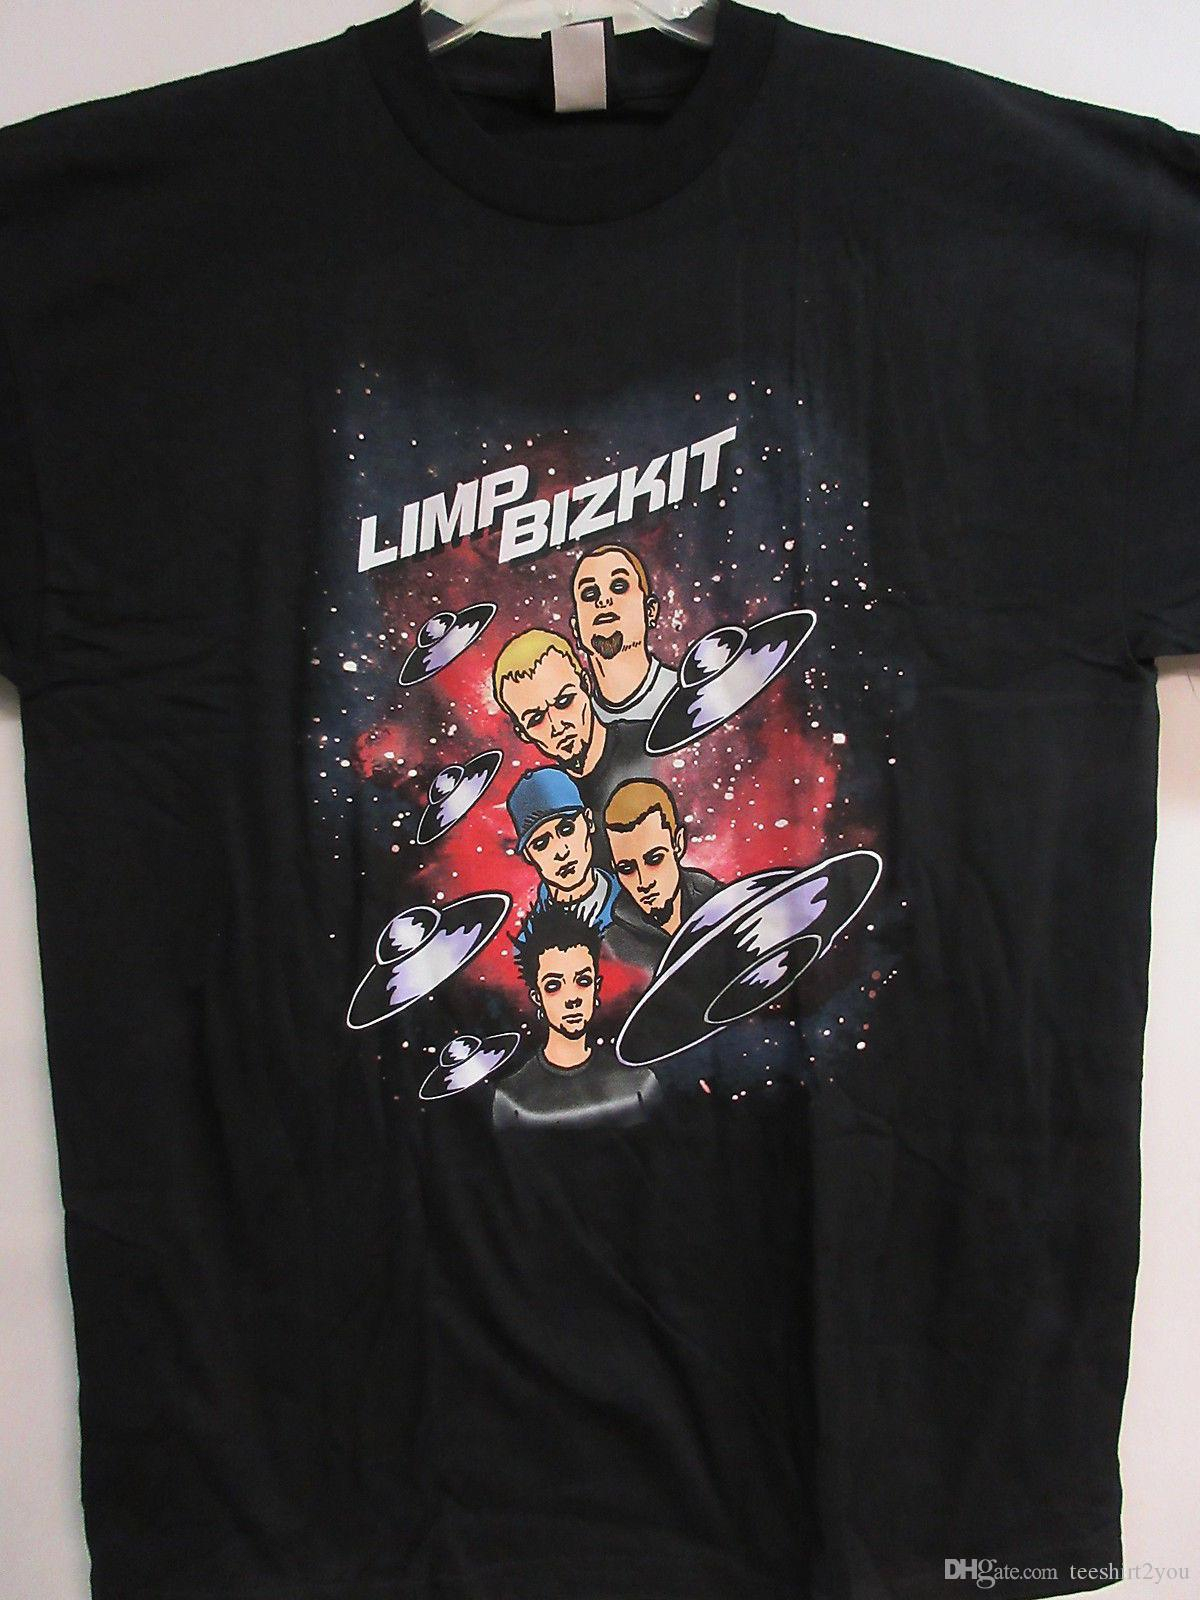 cbc19ab4c New Limp Bizkit Band Concert Music T Shirt Extra Large Tee Shirt Men Male  Costume Short Sleeve Thanksgiving Day Custom Big Size Men'S T Shir Tee  Shirt Funny ...